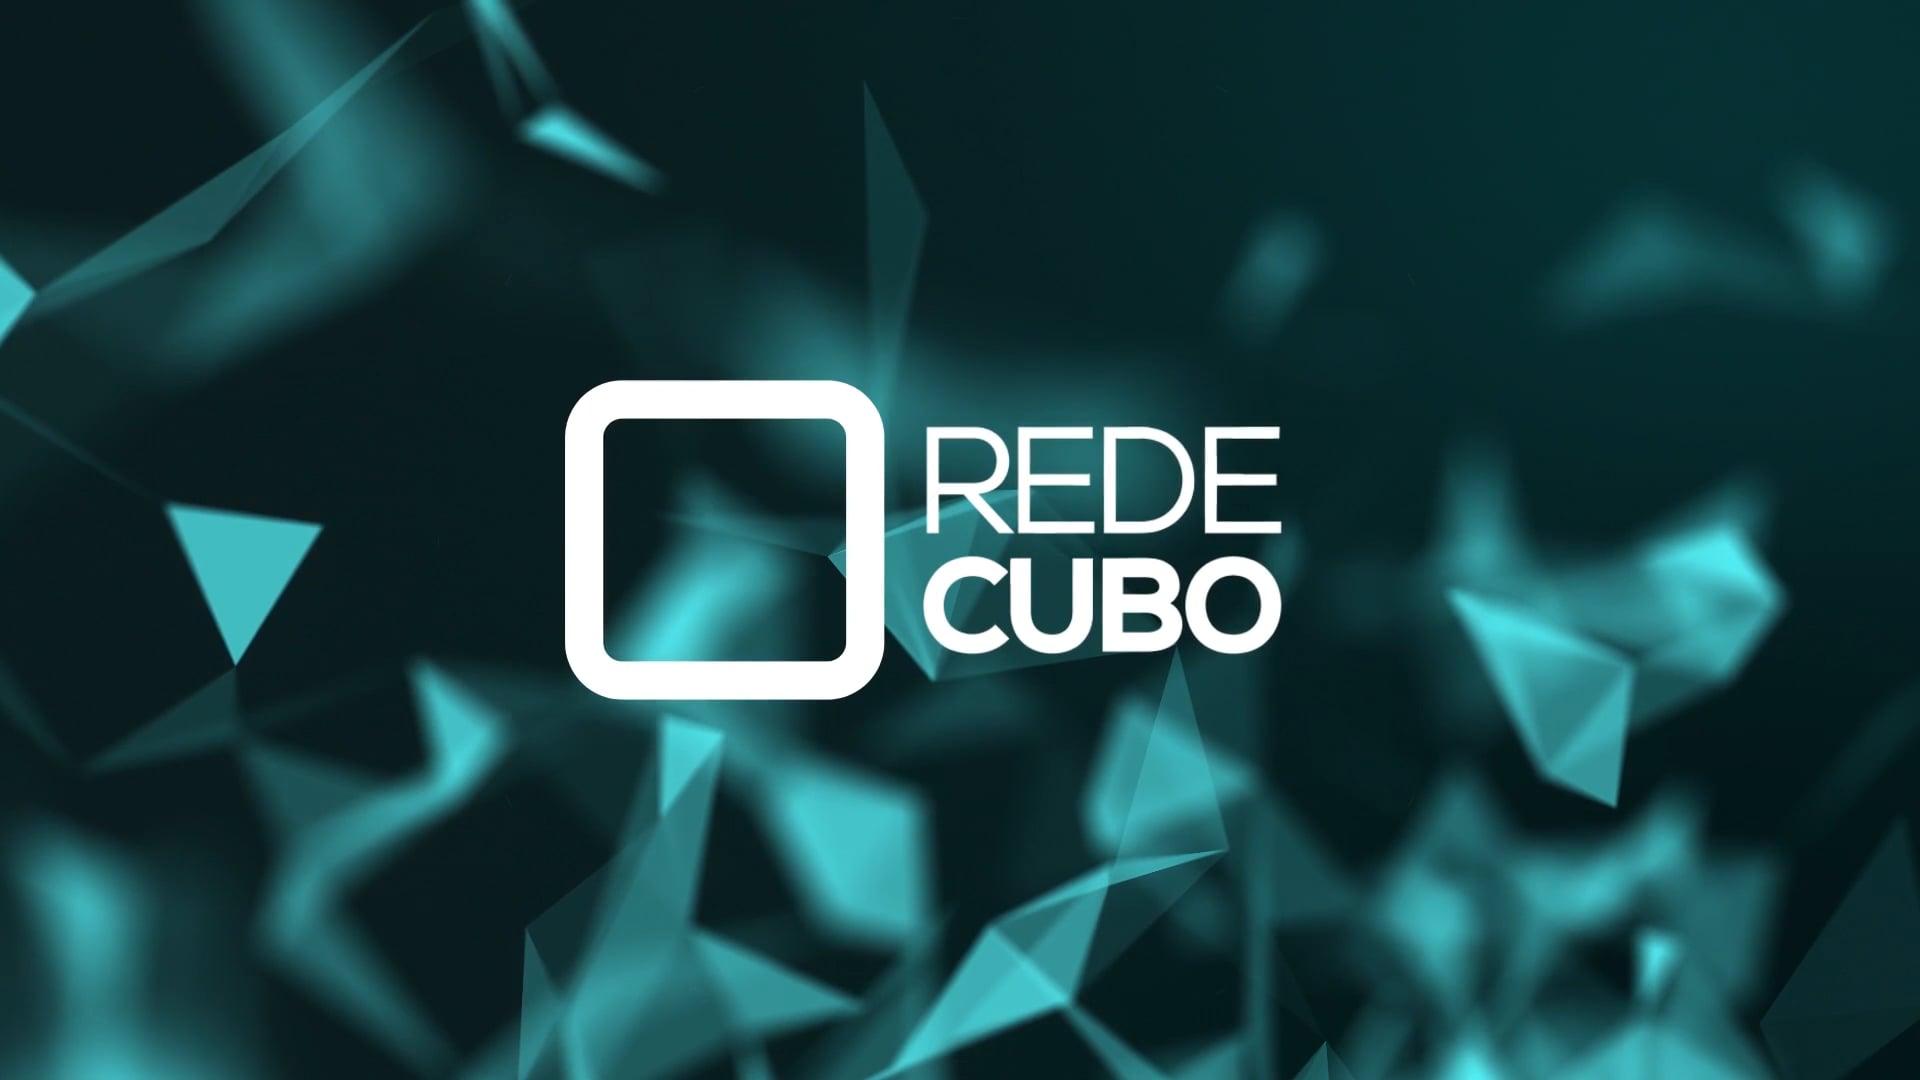 VINHETA REDE CUBO 2016